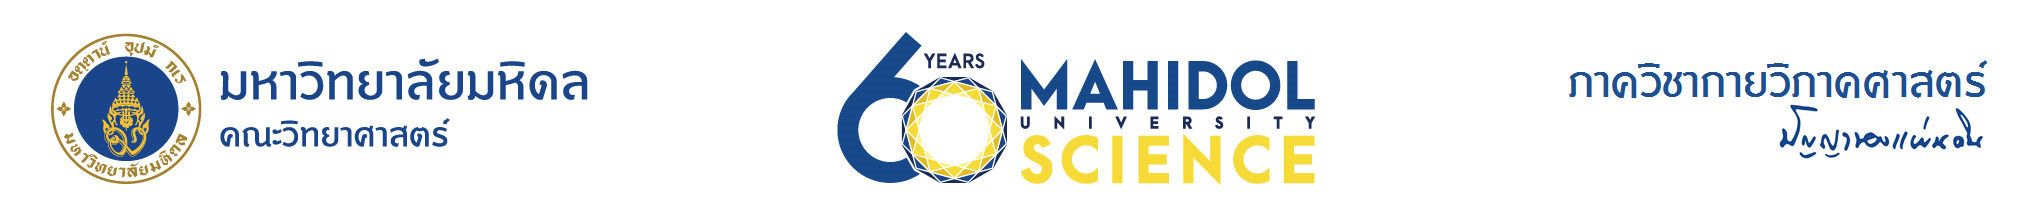 #Anatomy Mahidol #Anatomy MUSC #Department of Anatomy, Faculty of Science, Mahidol University. ภาควิชากายวิภาคศาสตร์ คณะวิทยาศาสตร์ มหาวิทยาลัยมหิดล